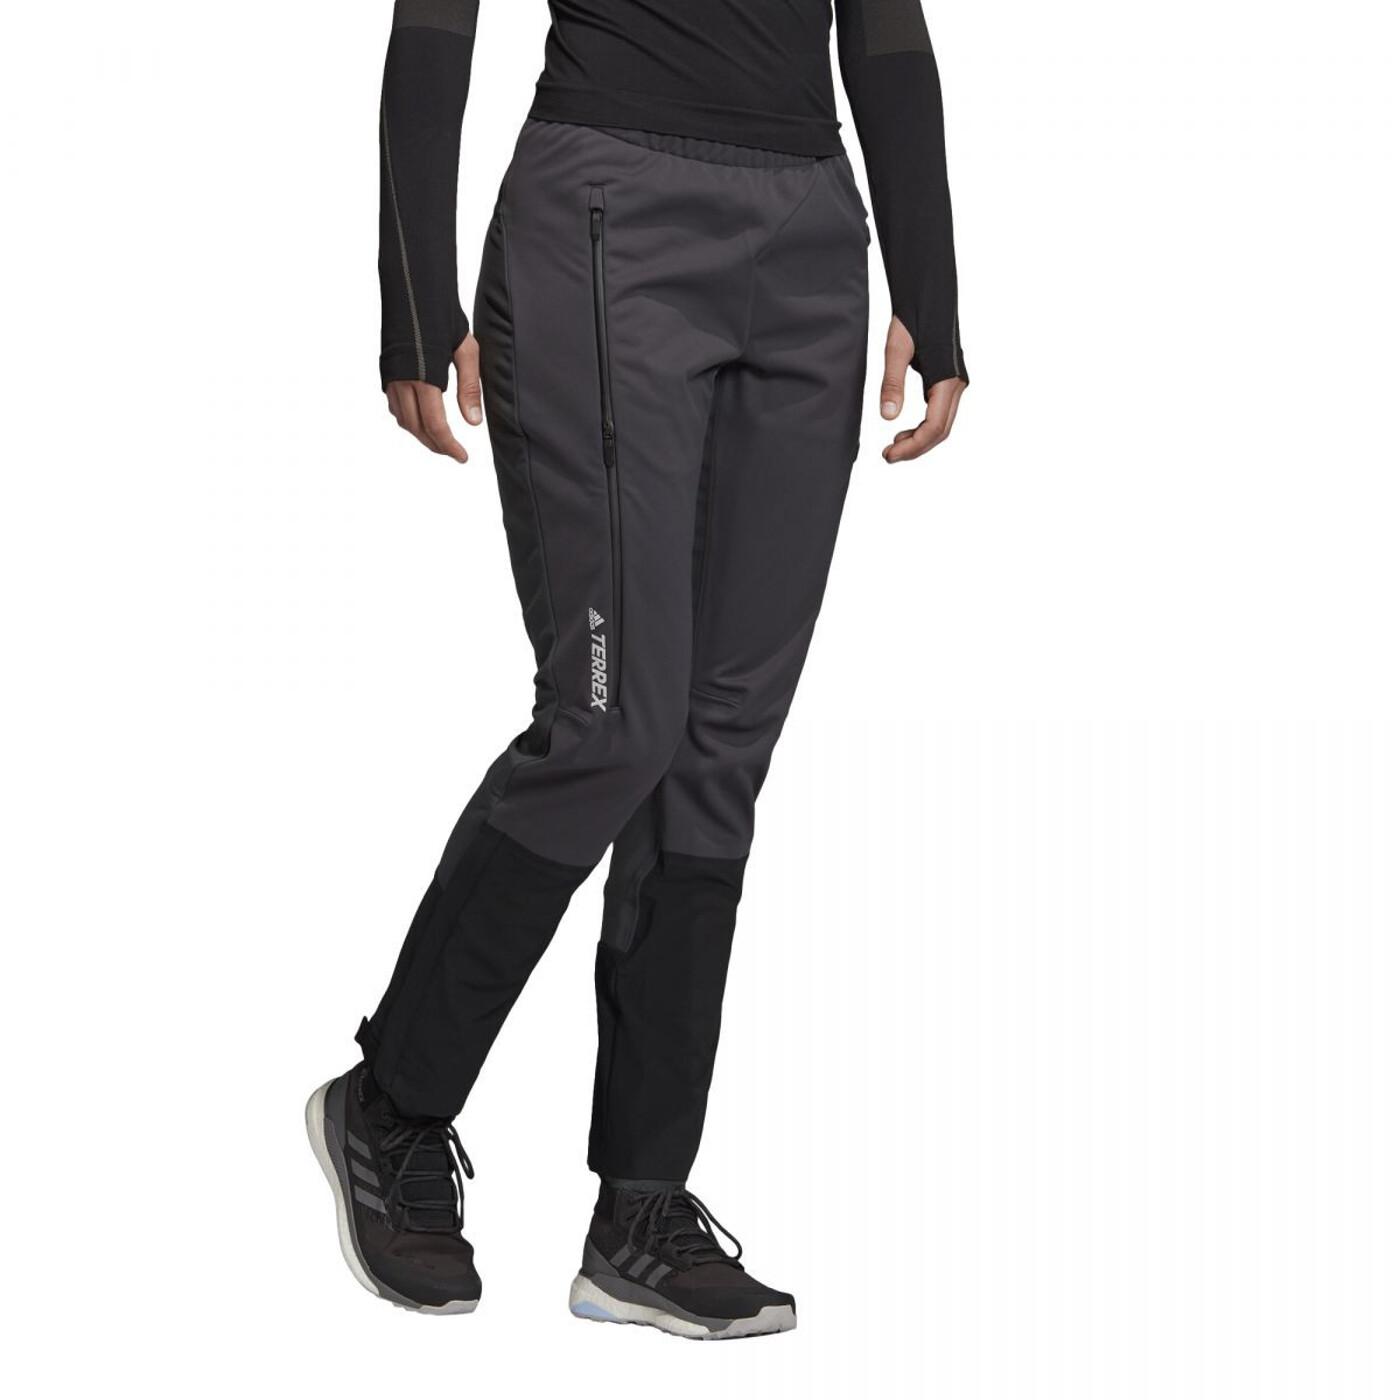 ADIDAS W Icesky Pants - Damen